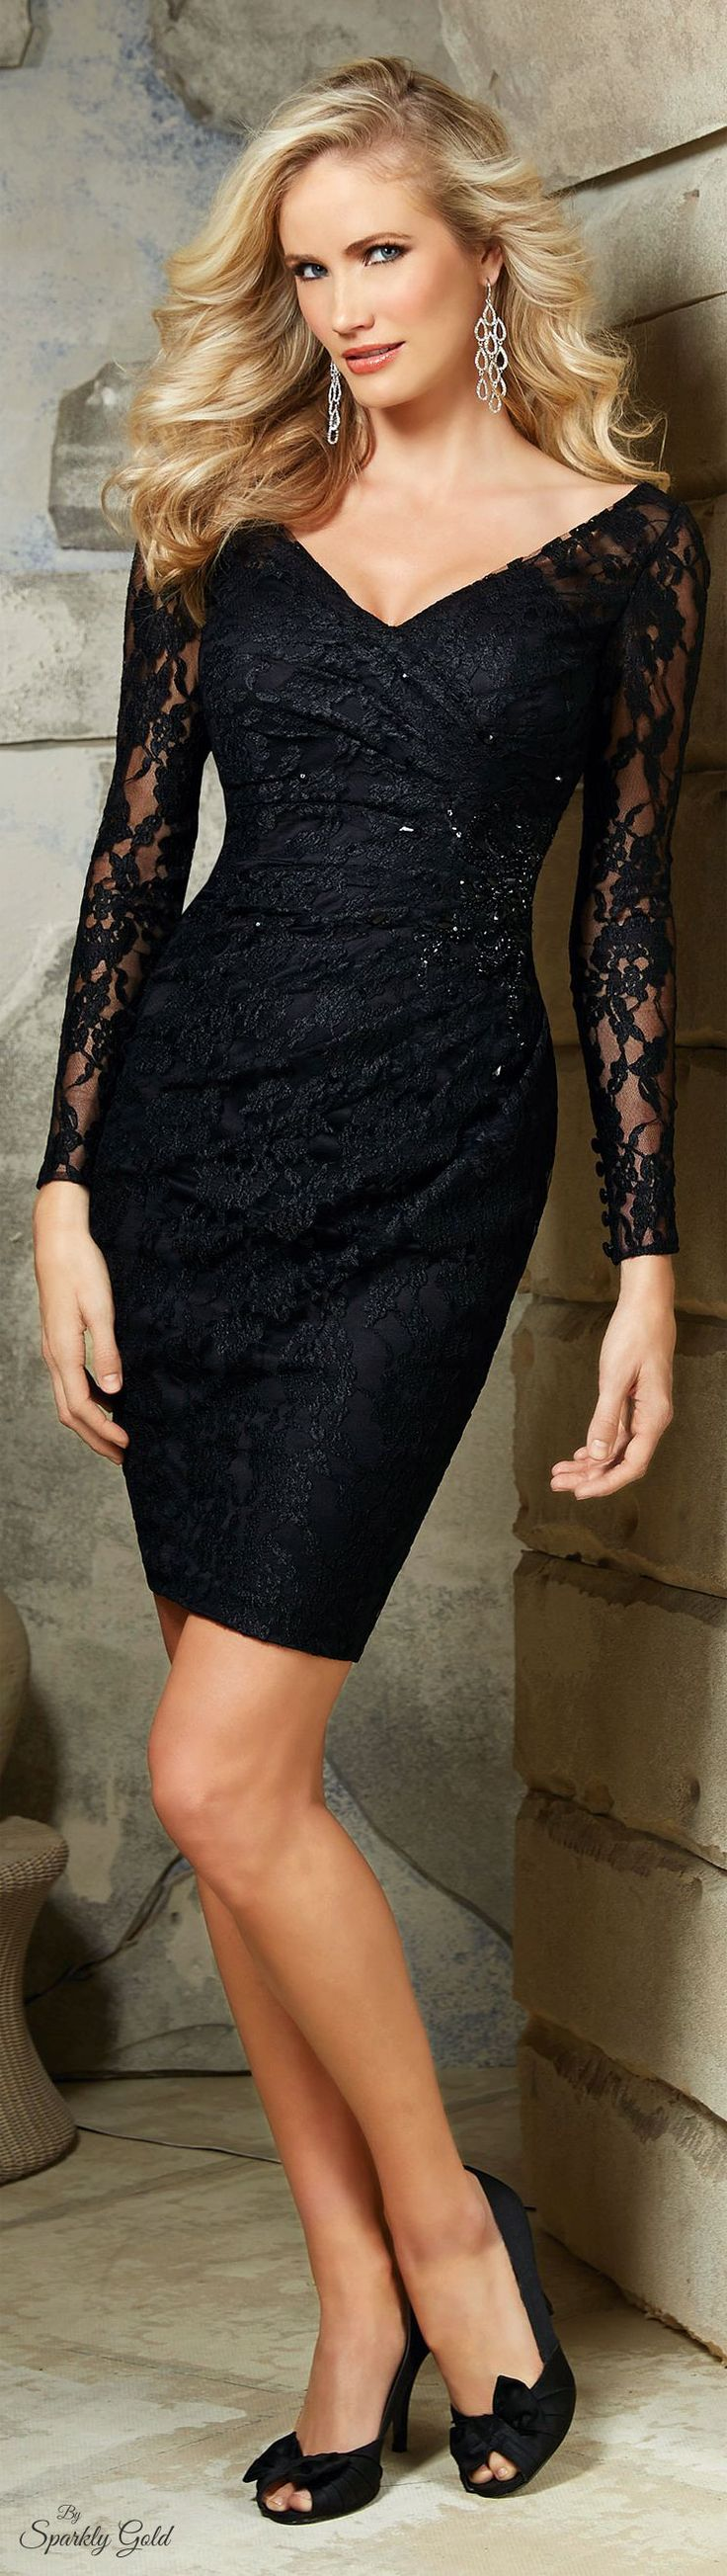 Mori Lee - VM women fashion outfit clothing style apparel @roressclothes closet ideas